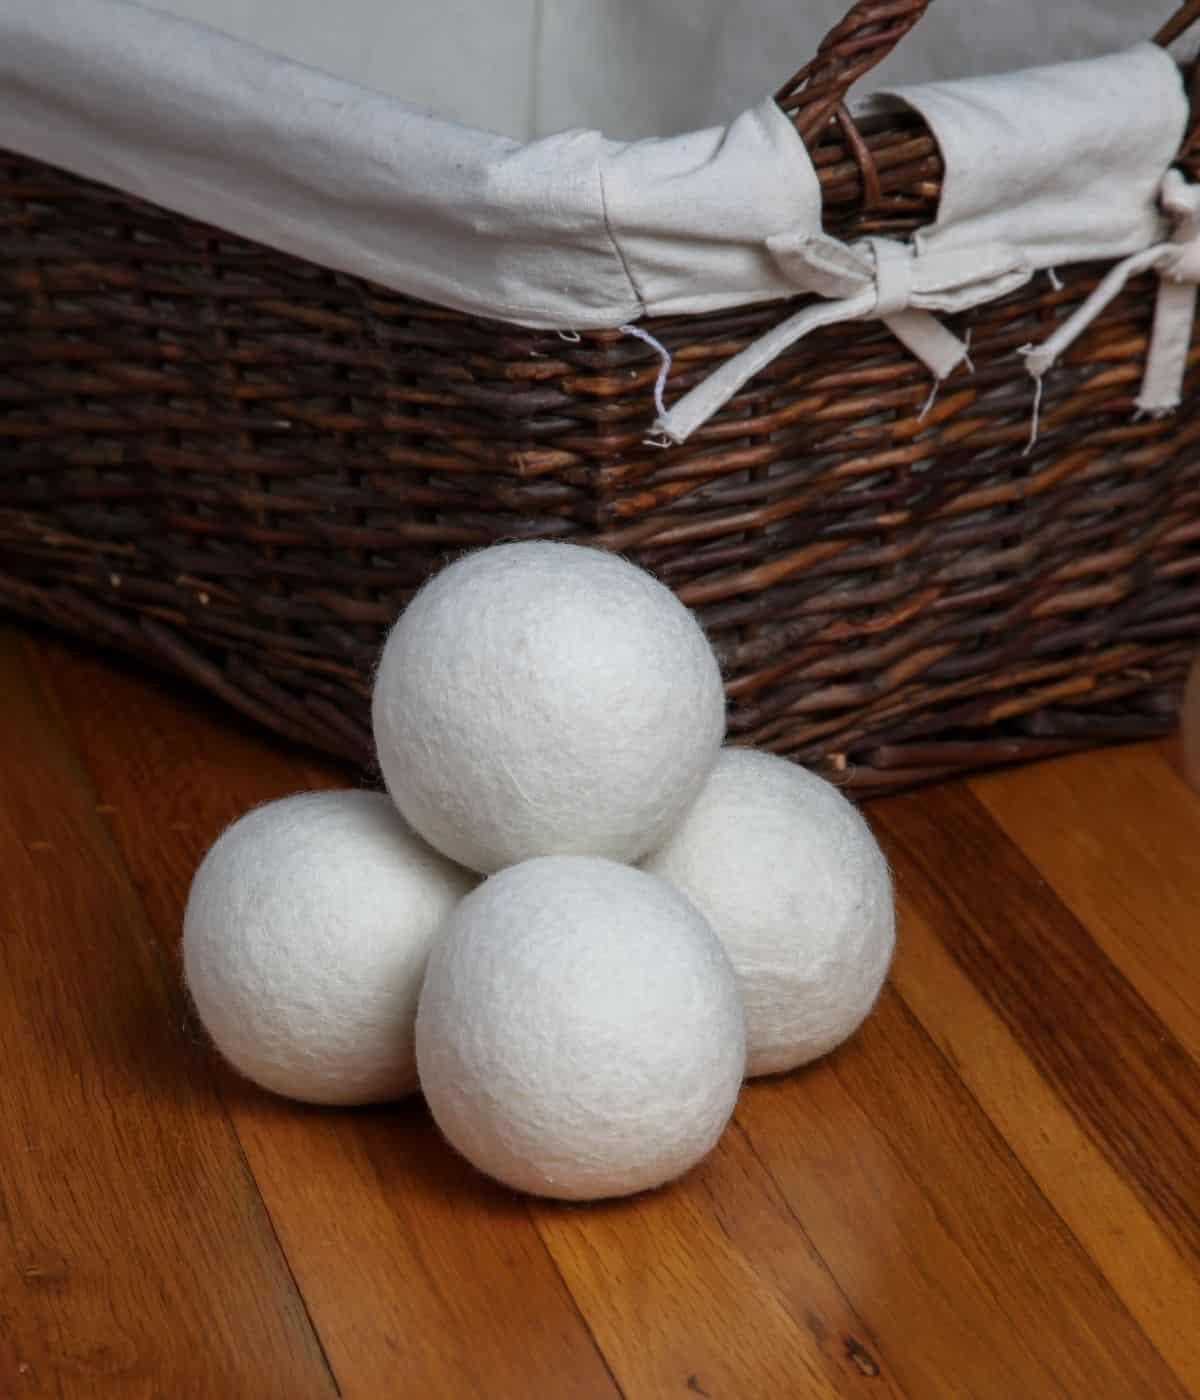 Dryer balls on table.